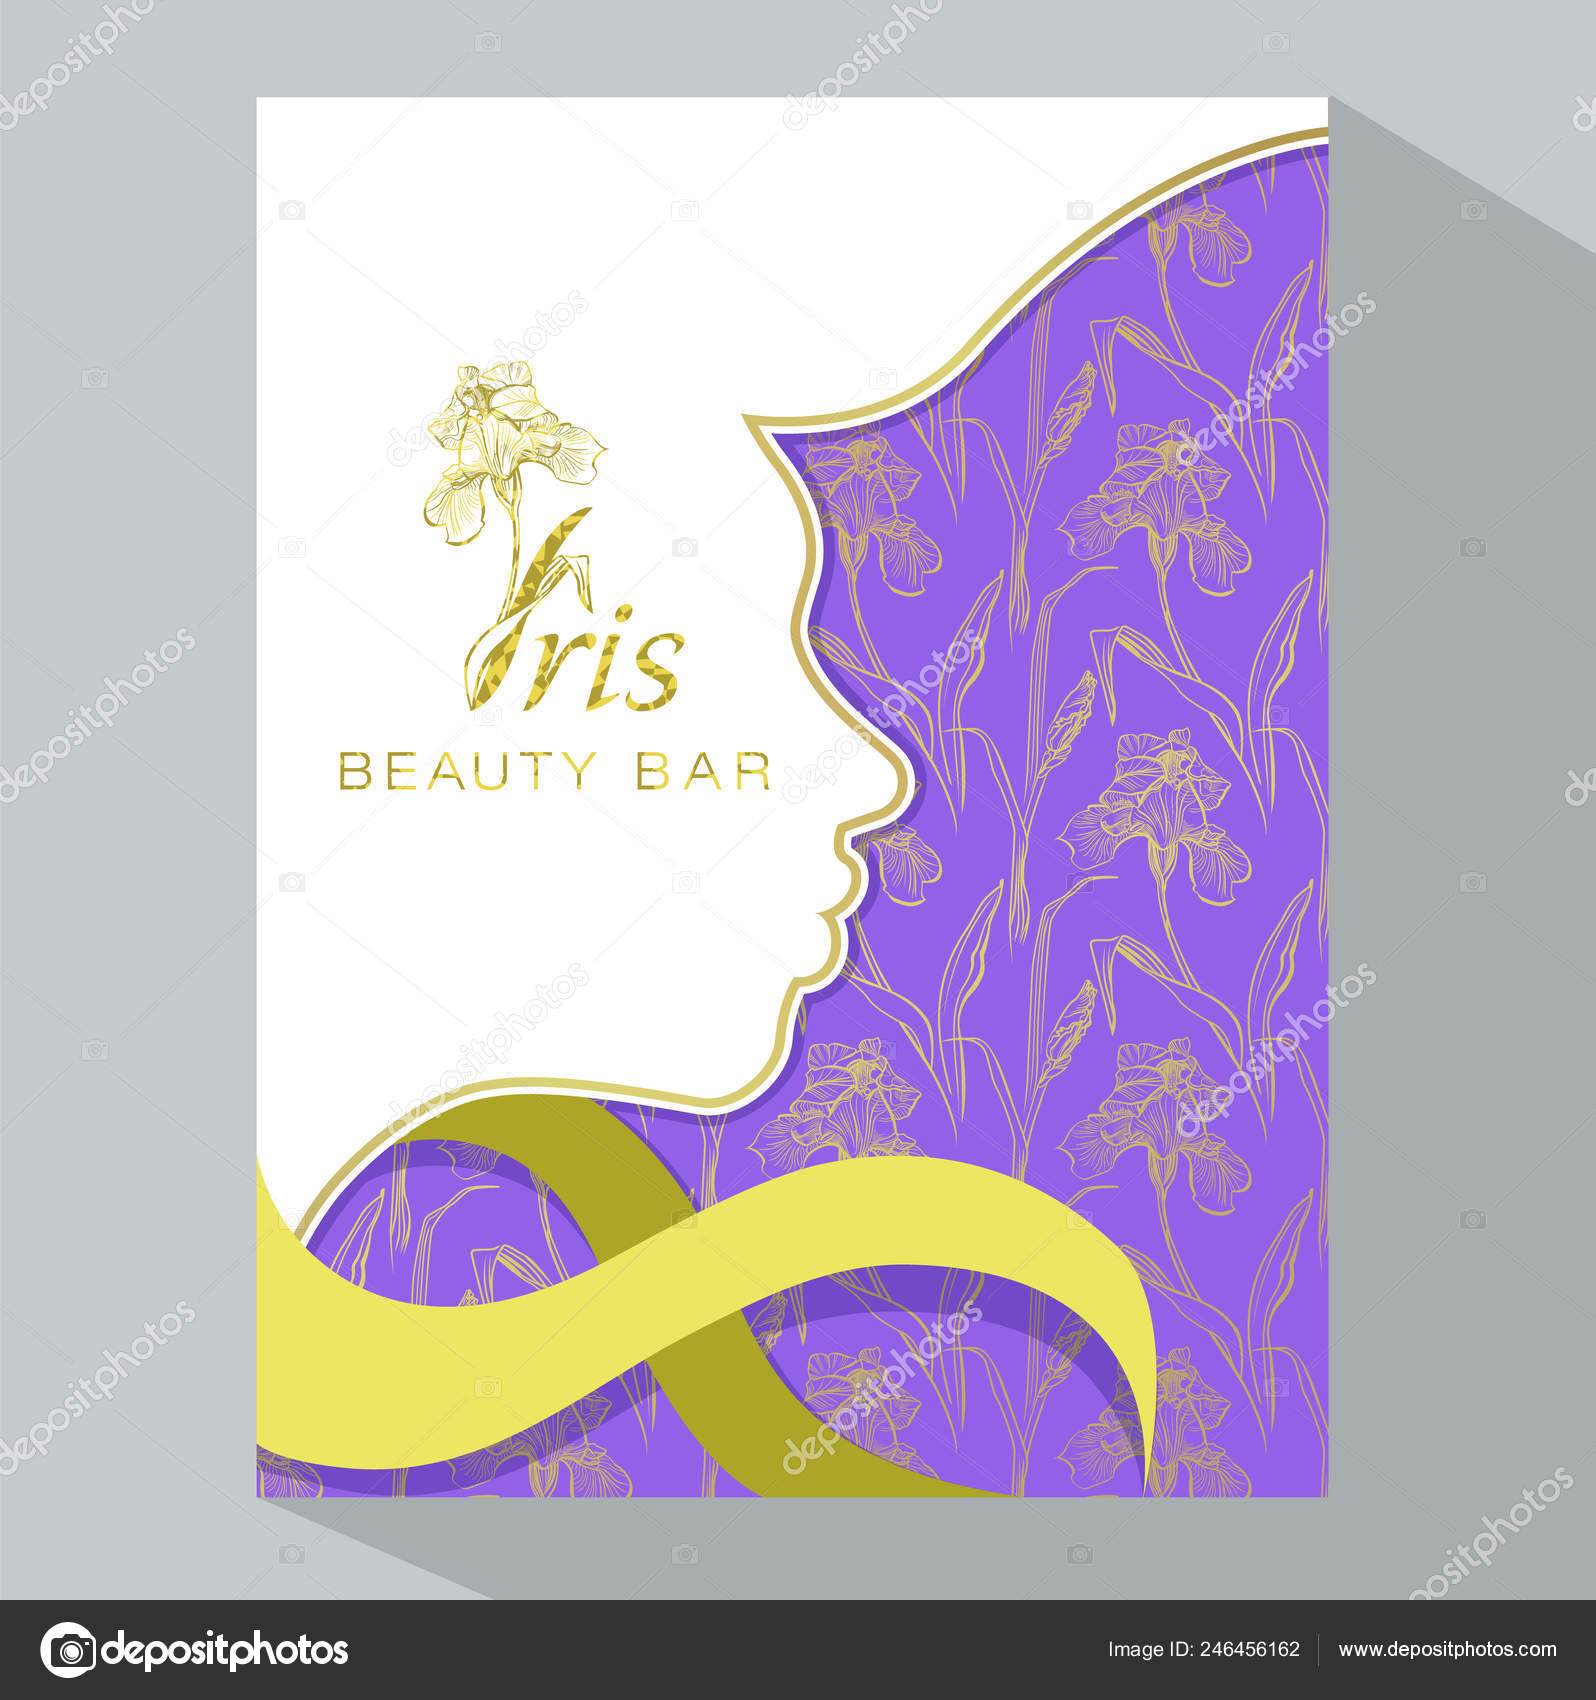 Iris Beauty Bar Banner Vector Beauty Salon Hotel Salon Beauty Stock Vector C Marina Eisymant 246456162